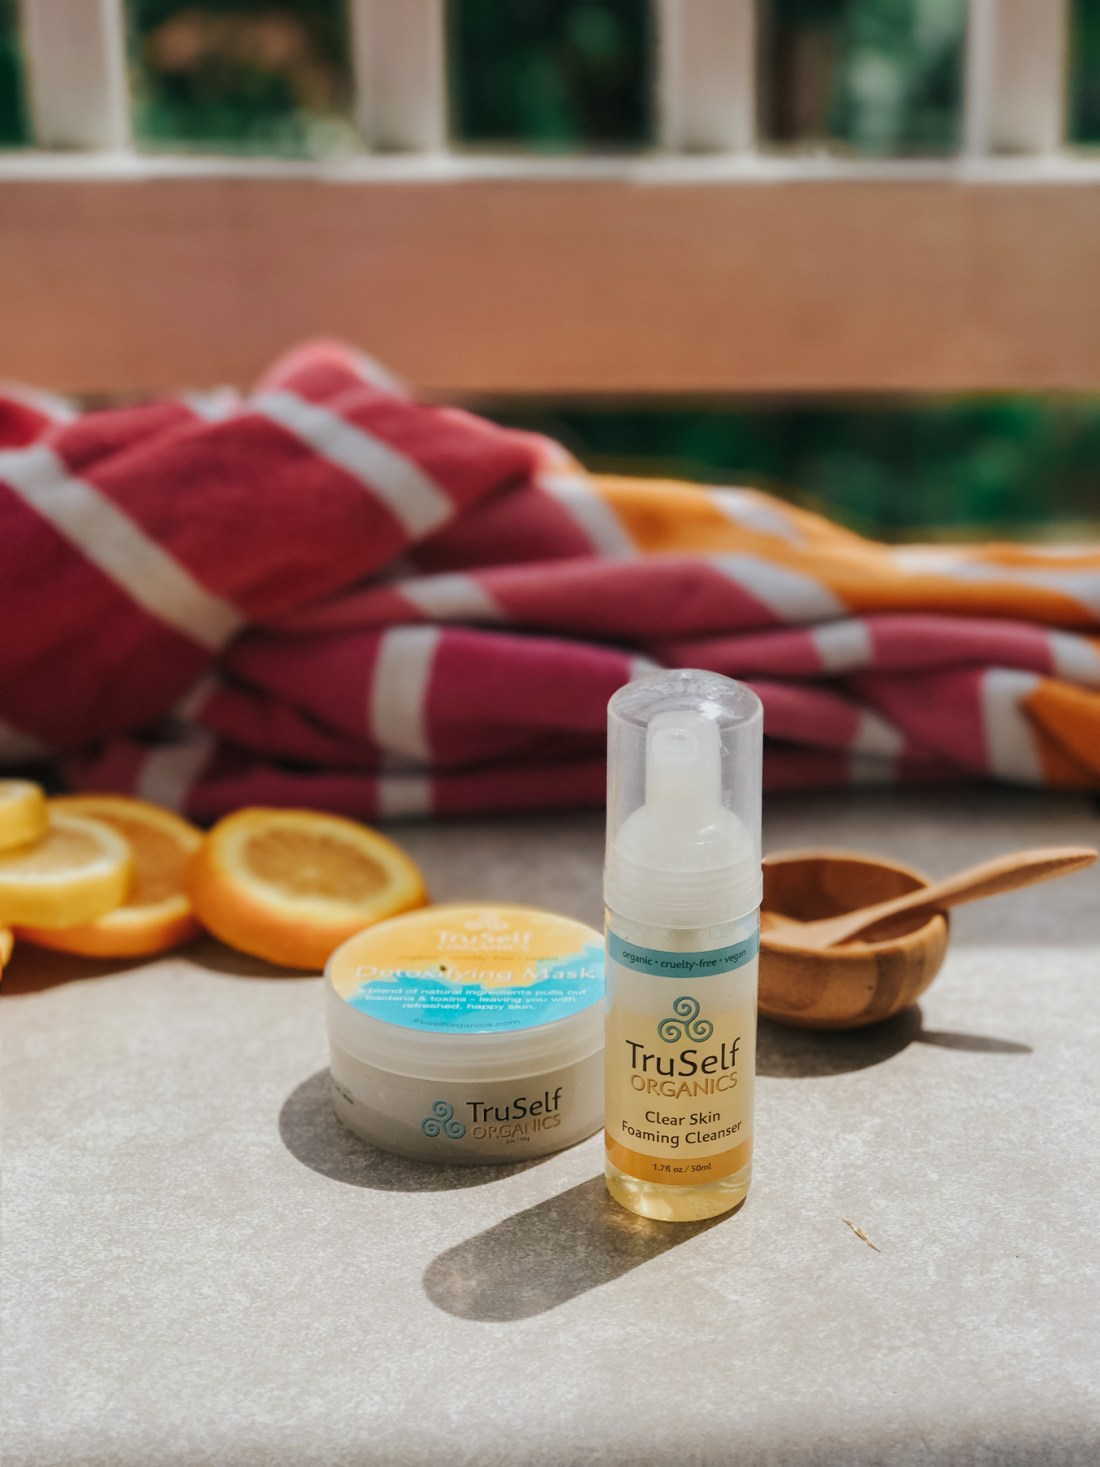 TruSelf Organics Detoxifying Mask & Clear Skin Foaming Cleanser, Organic Skincare, leaping bunny certified, cruelty-free skincare, cruelty-free brands | @truselforganics